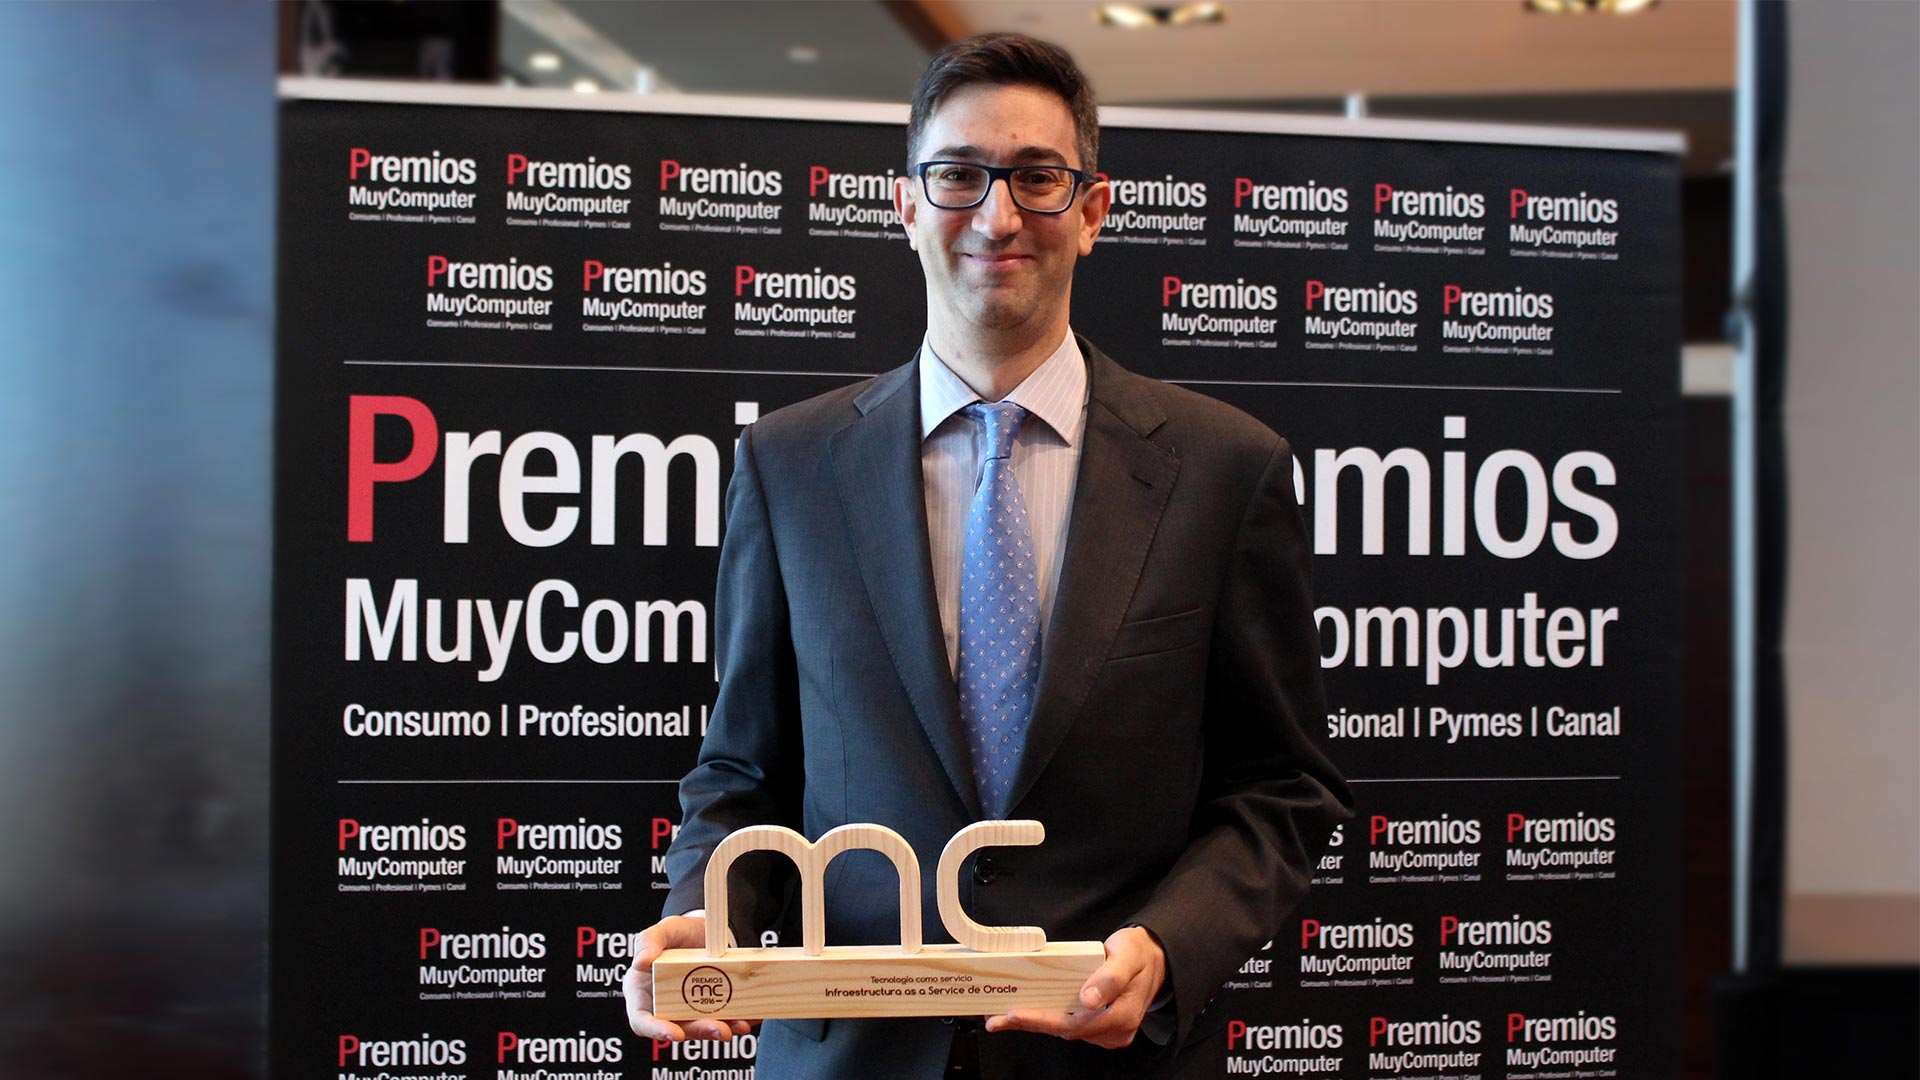 premiosmc2016-tecnologia-como-servicio-oracle